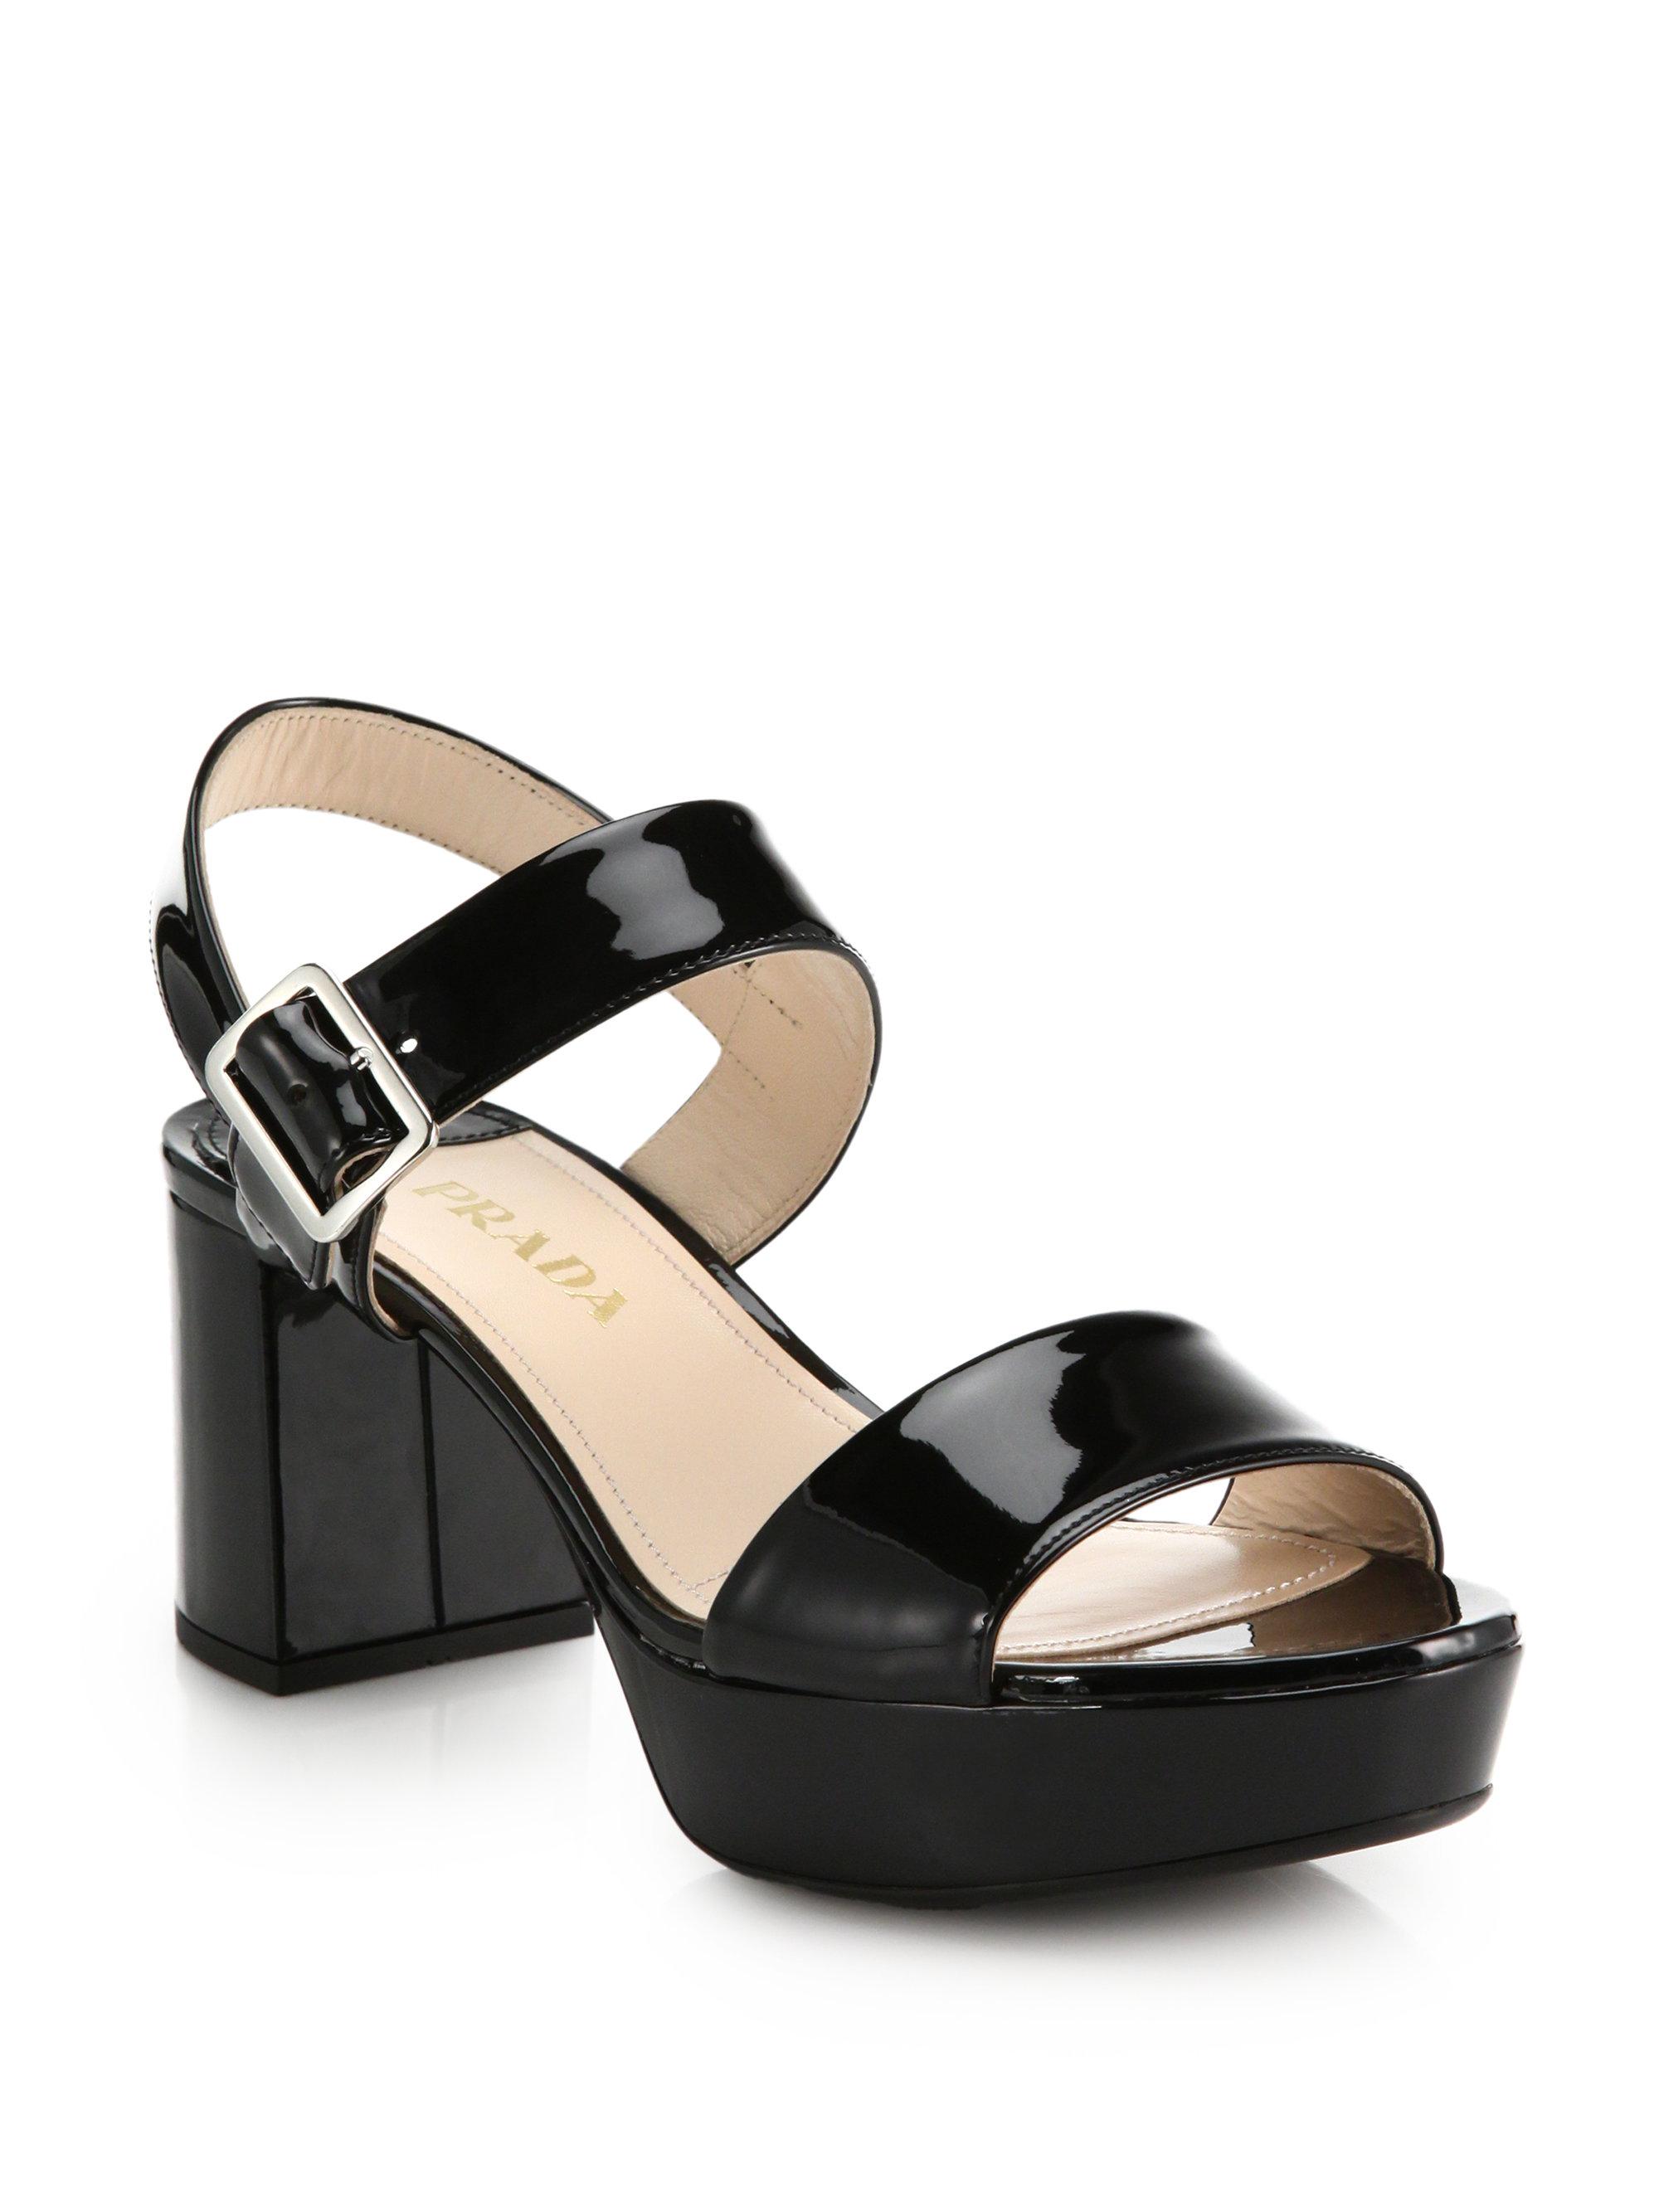 Prada Patent Leather Buckle Sandals big discount cheap online 8DbvkeF